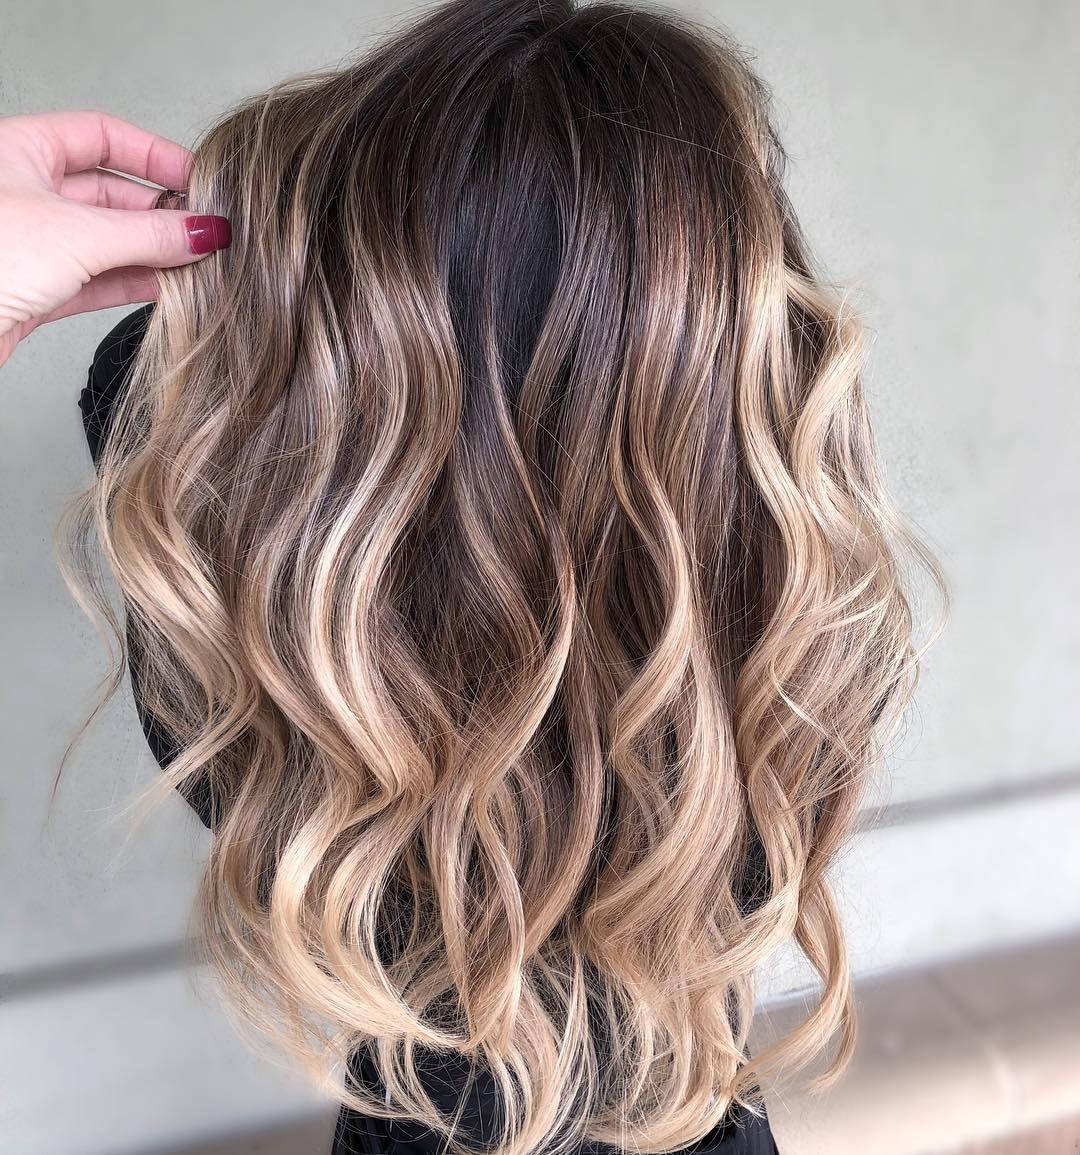 35+ Low maintenance highlights for dark hair inspirations